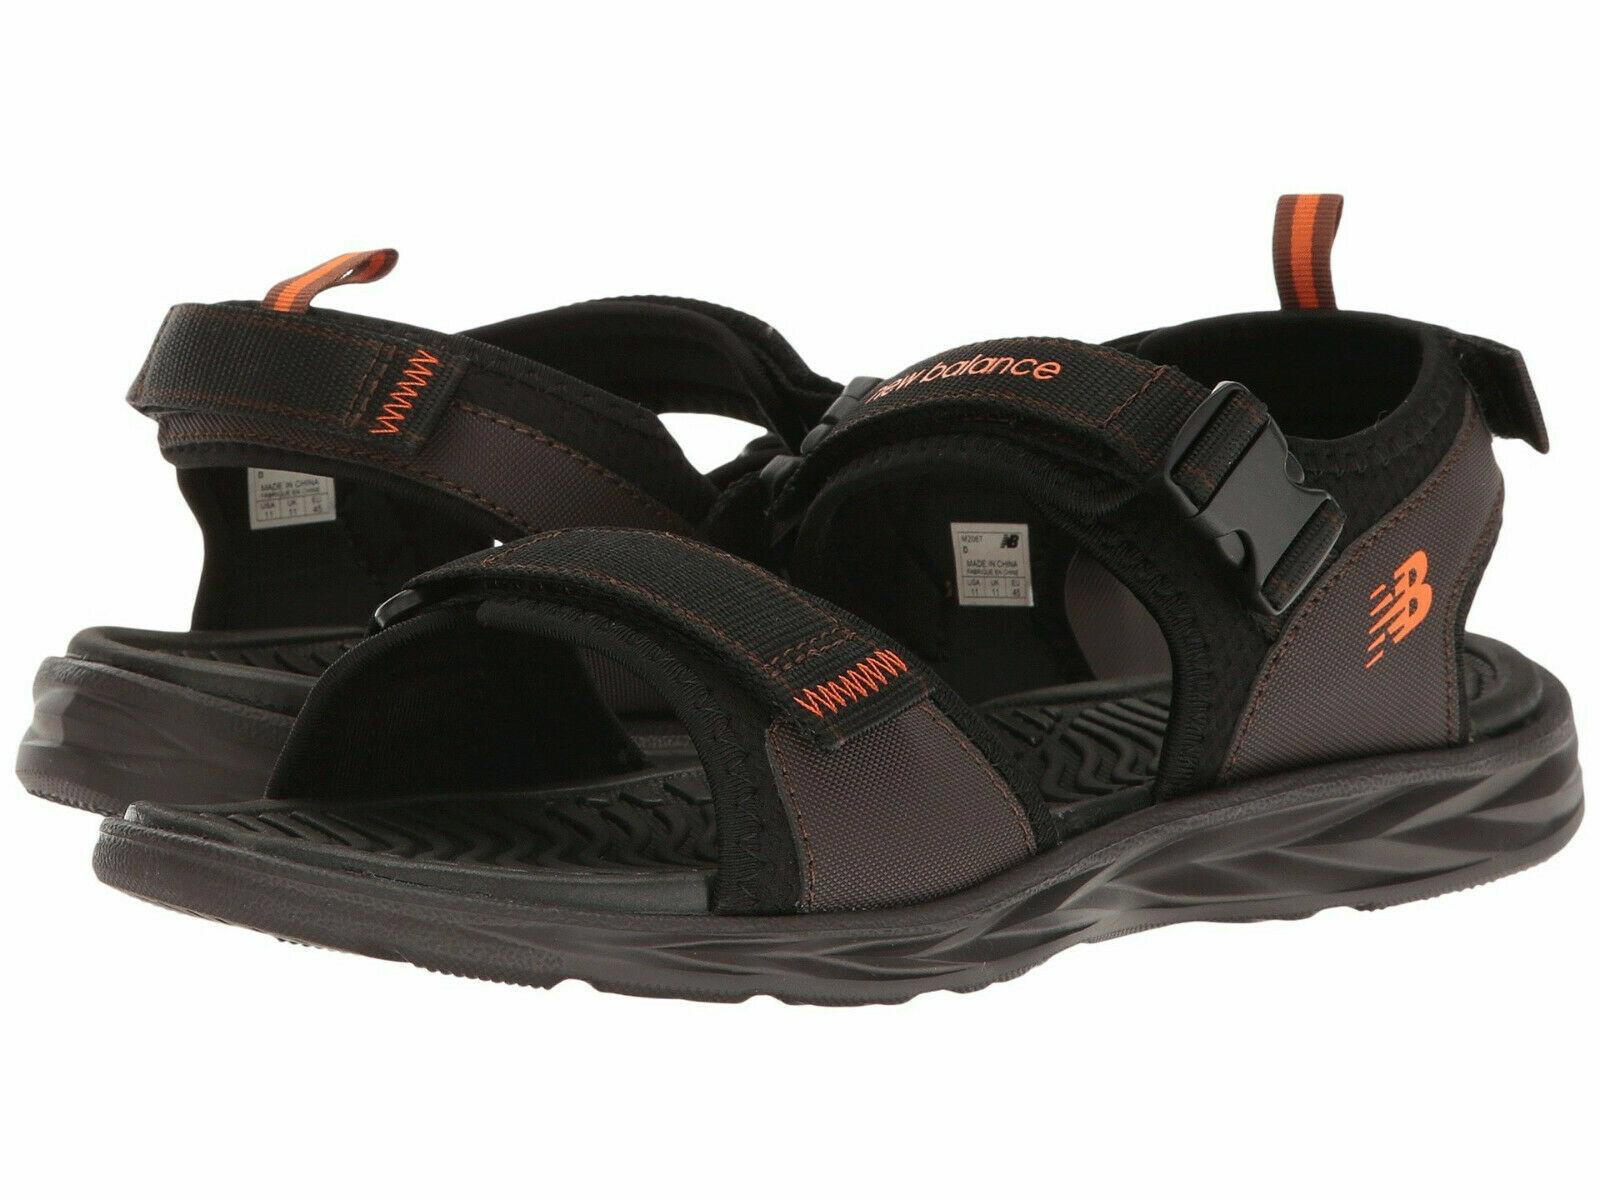 Men New Balance Balance Balance Response Adjustable Sandal M2067BR Brown 100% Authentic New dee3b8